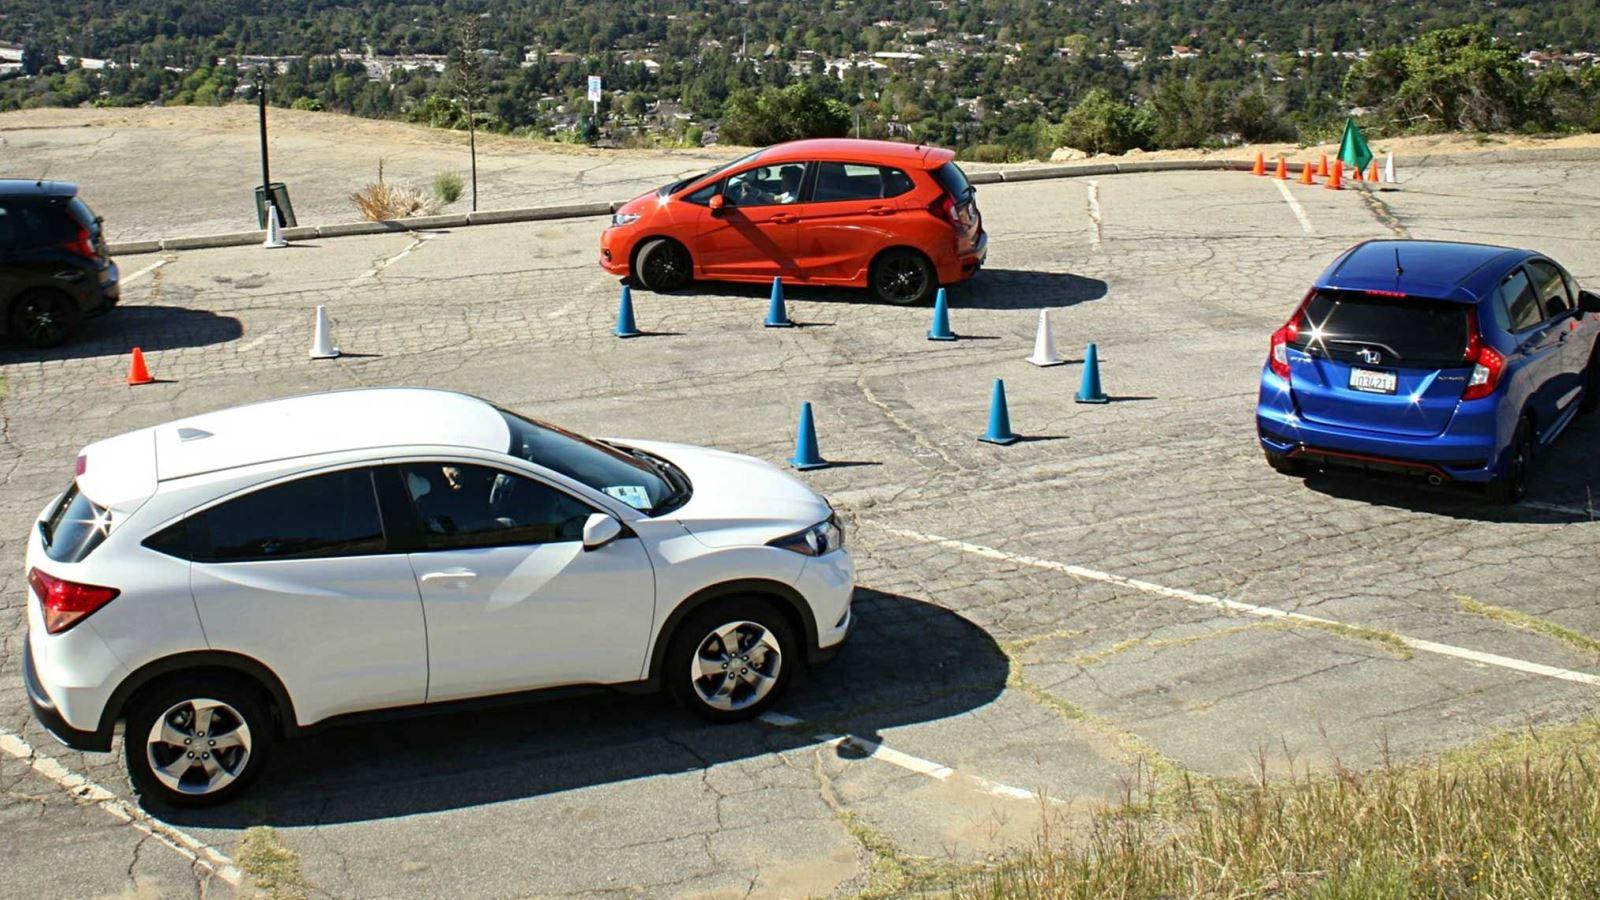 Honda's Shifting Gears to Teach Manual Driving